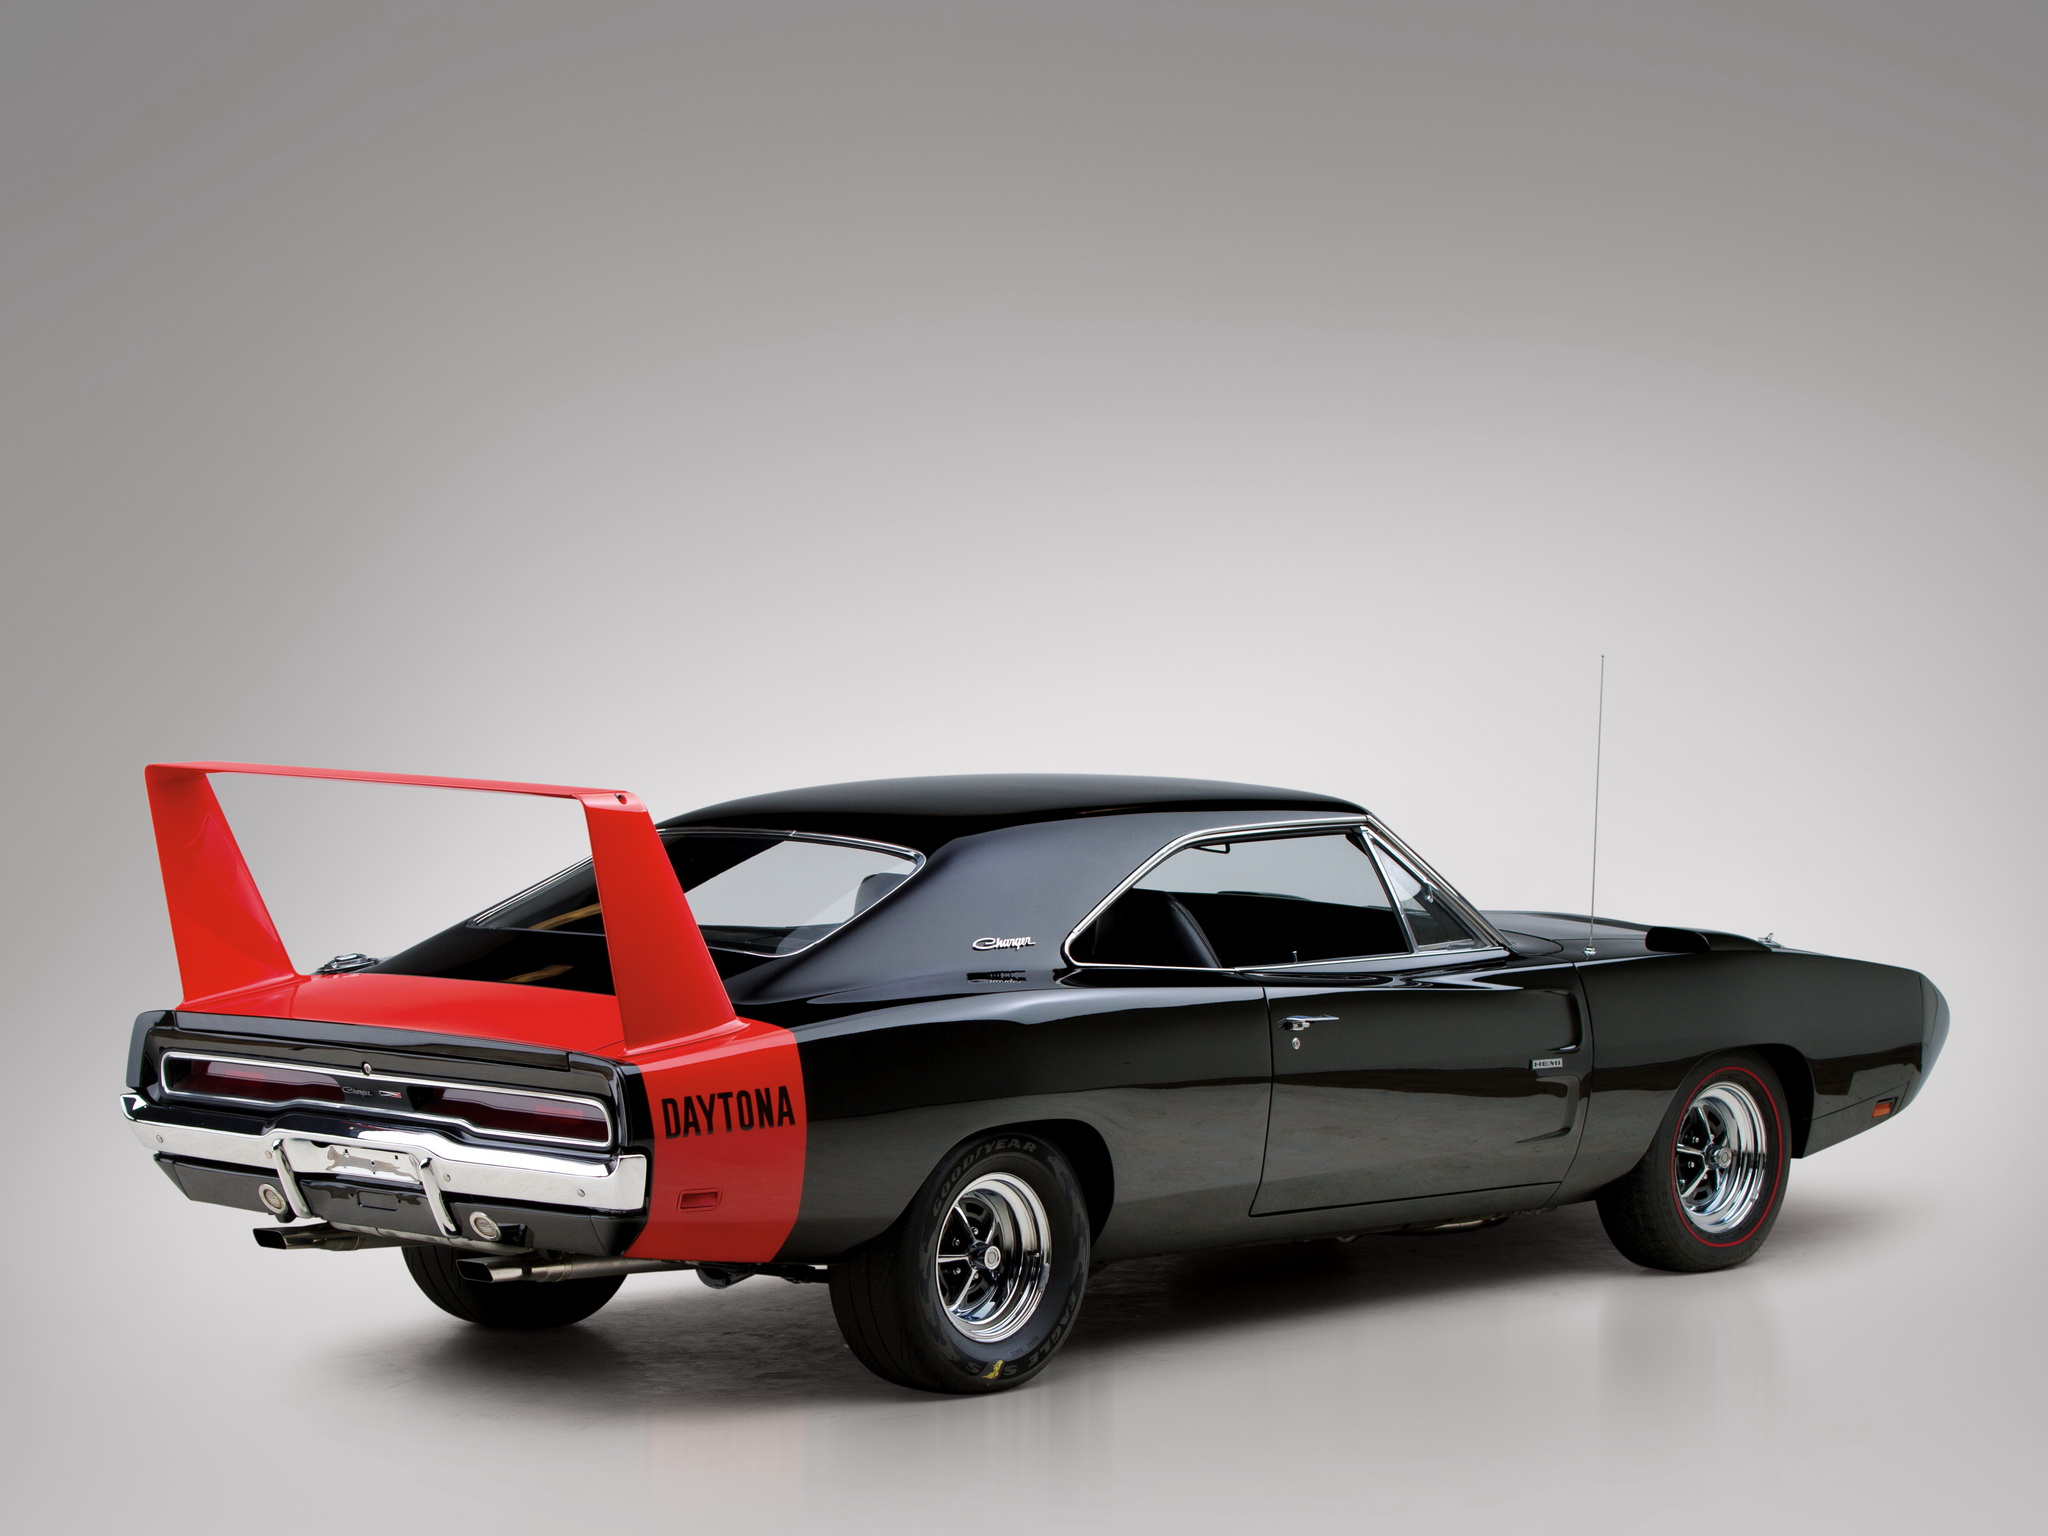 1969 dodge charger daytona hemi supercar supercars muscle classic